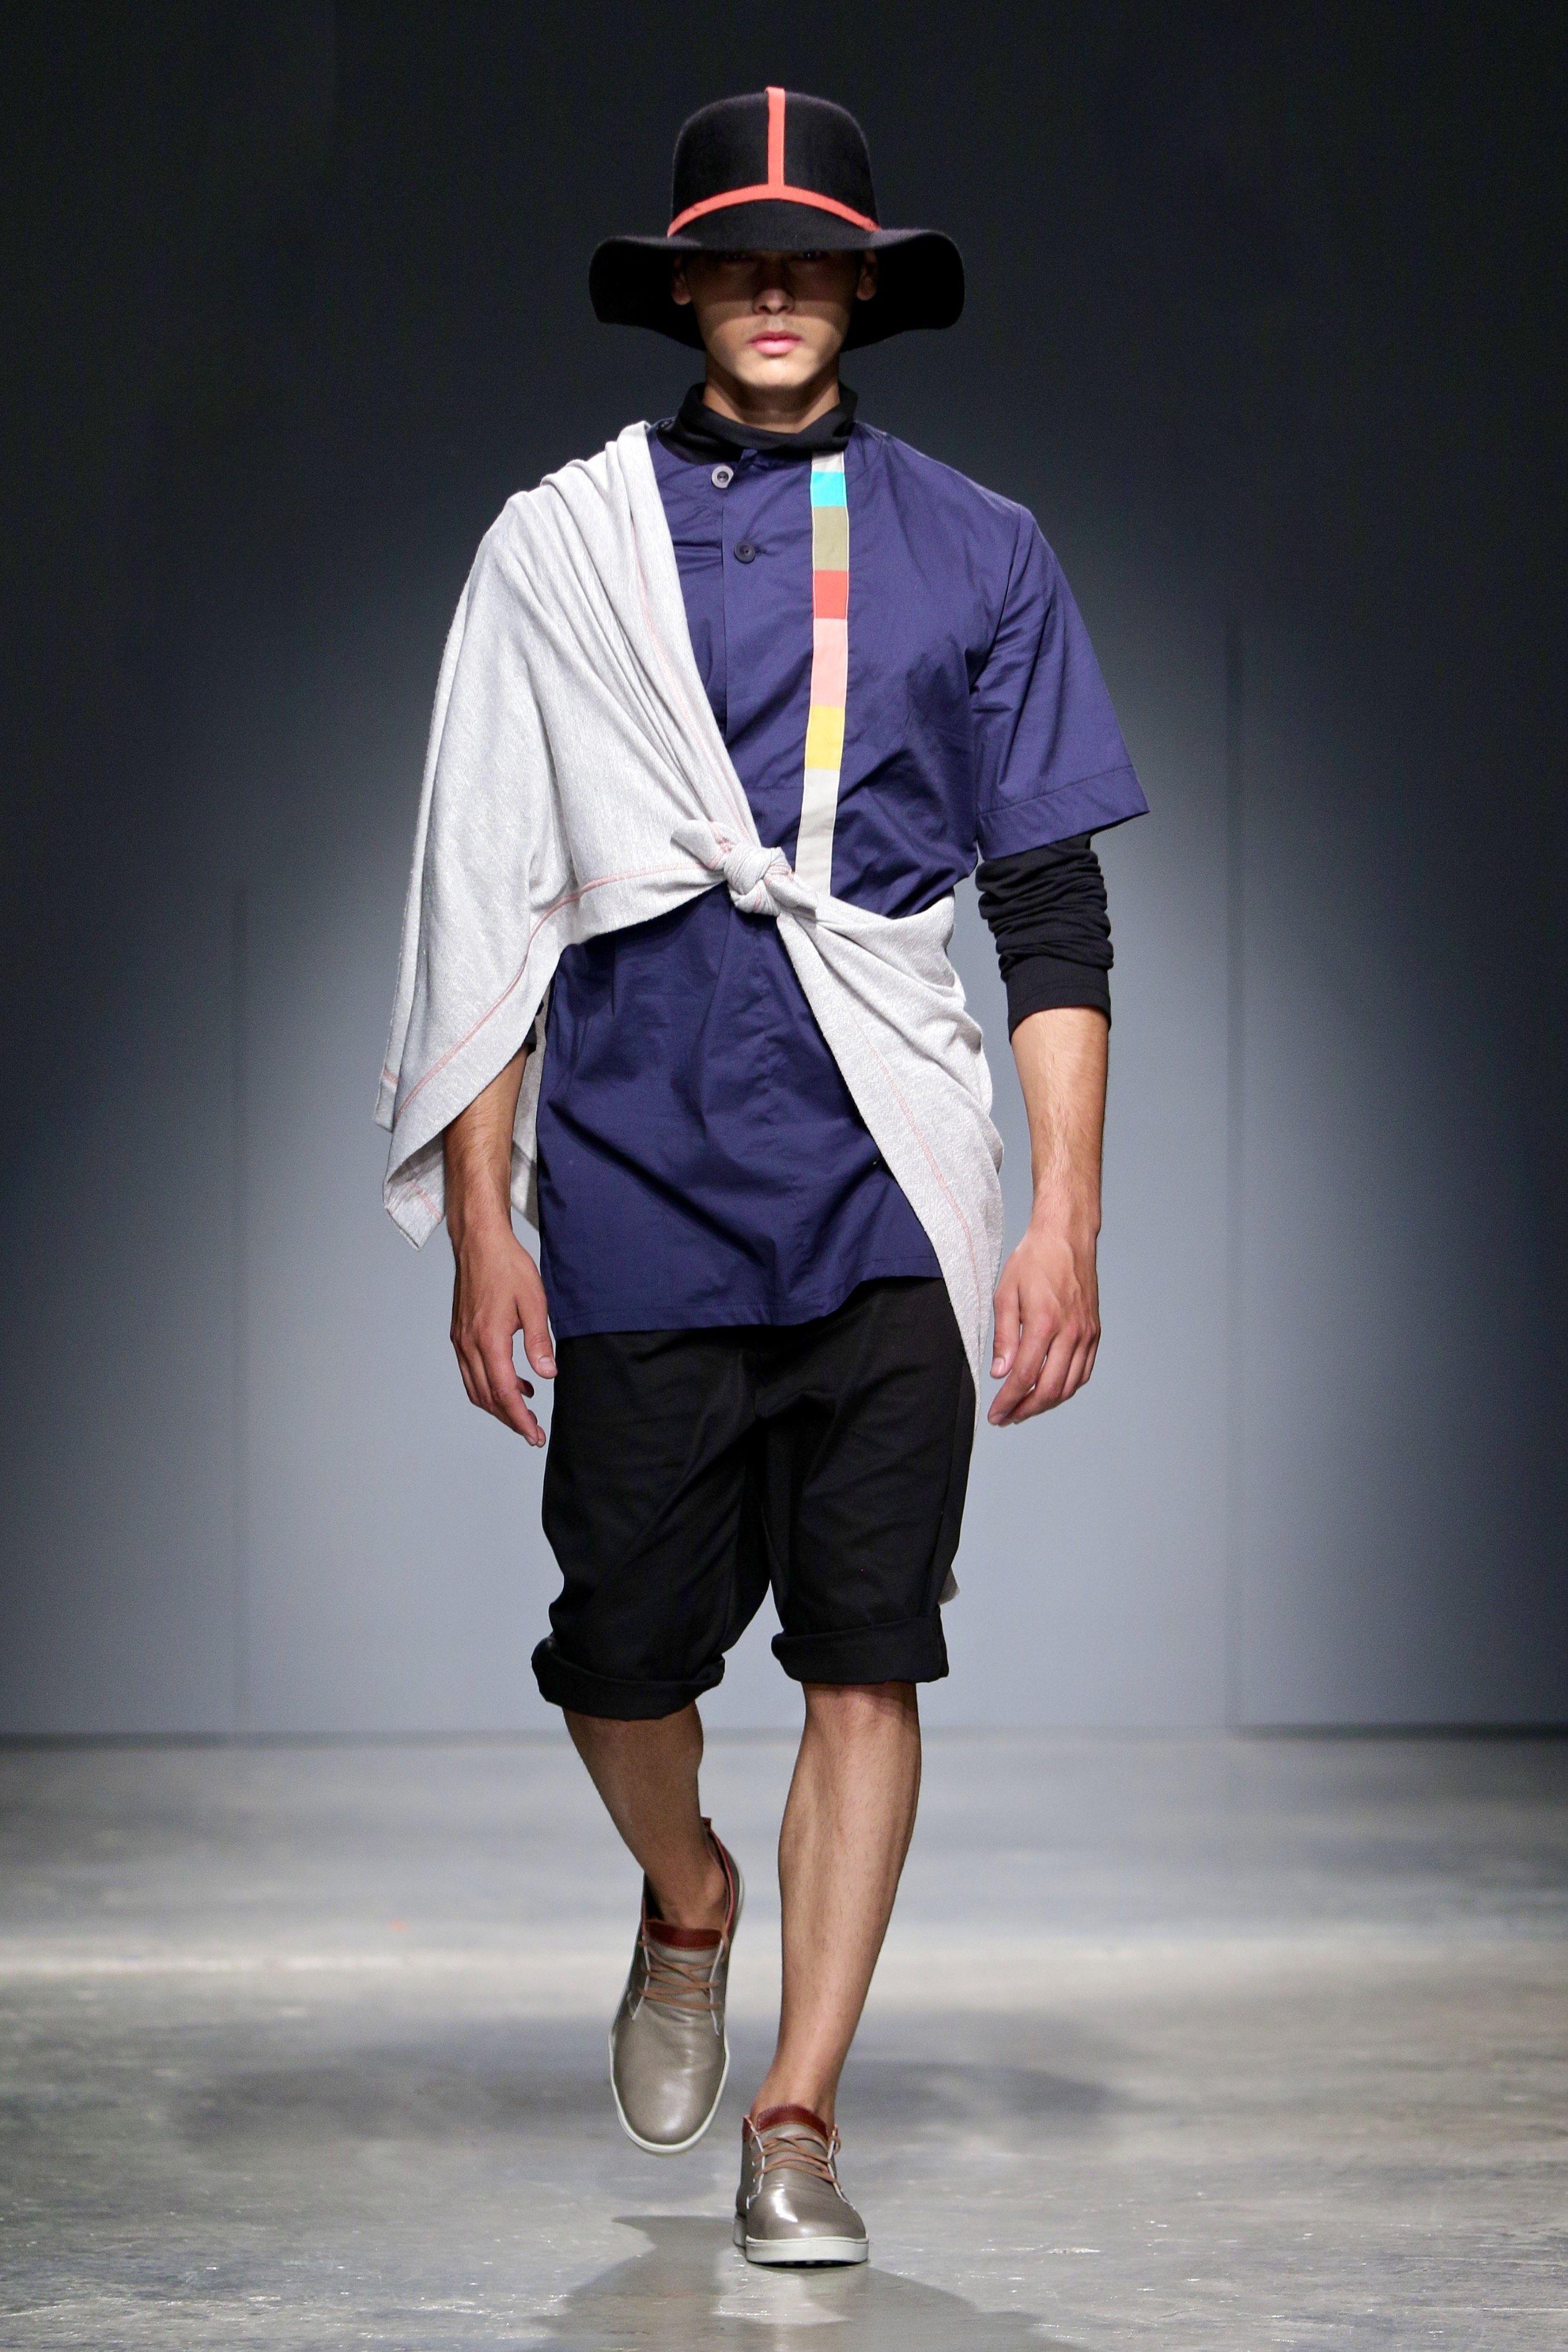 #Menswear #Trends #Tendencias #Moda Hombre #Africa 2016 SA Menswear Week AW16  Amanda Laird Cherry Otoño Invierno - SDR